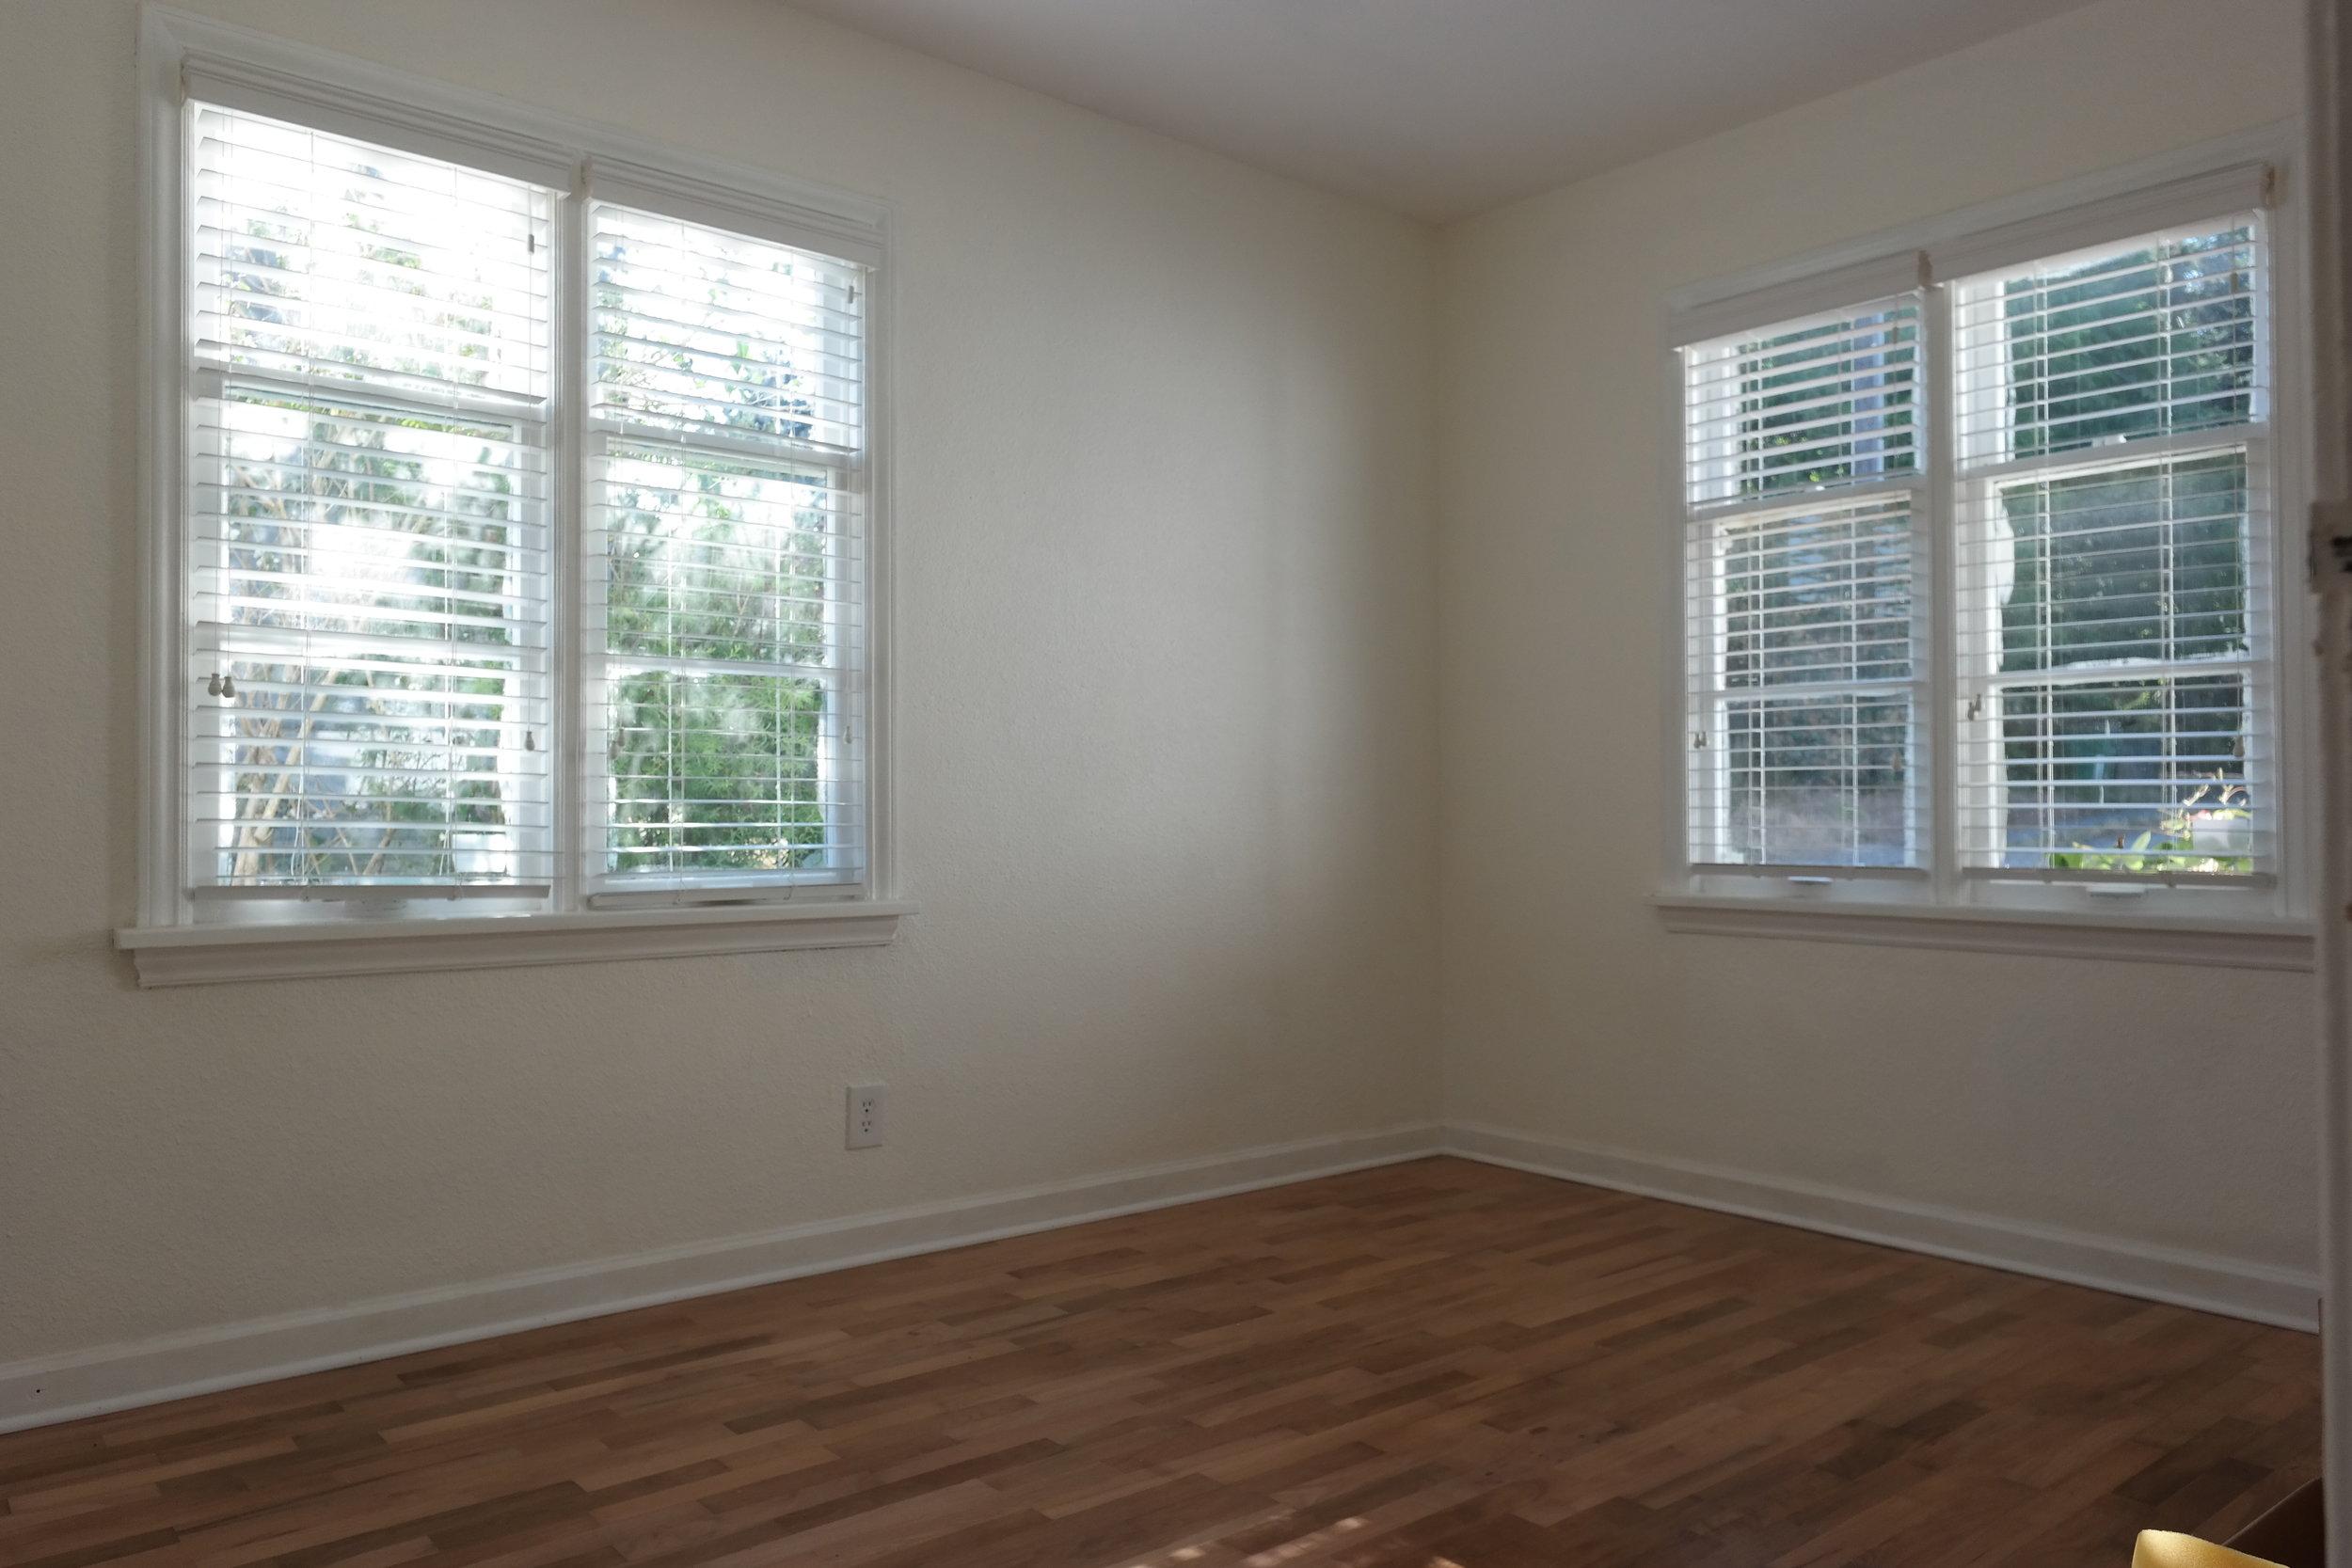 11-Bedroom202.JPG